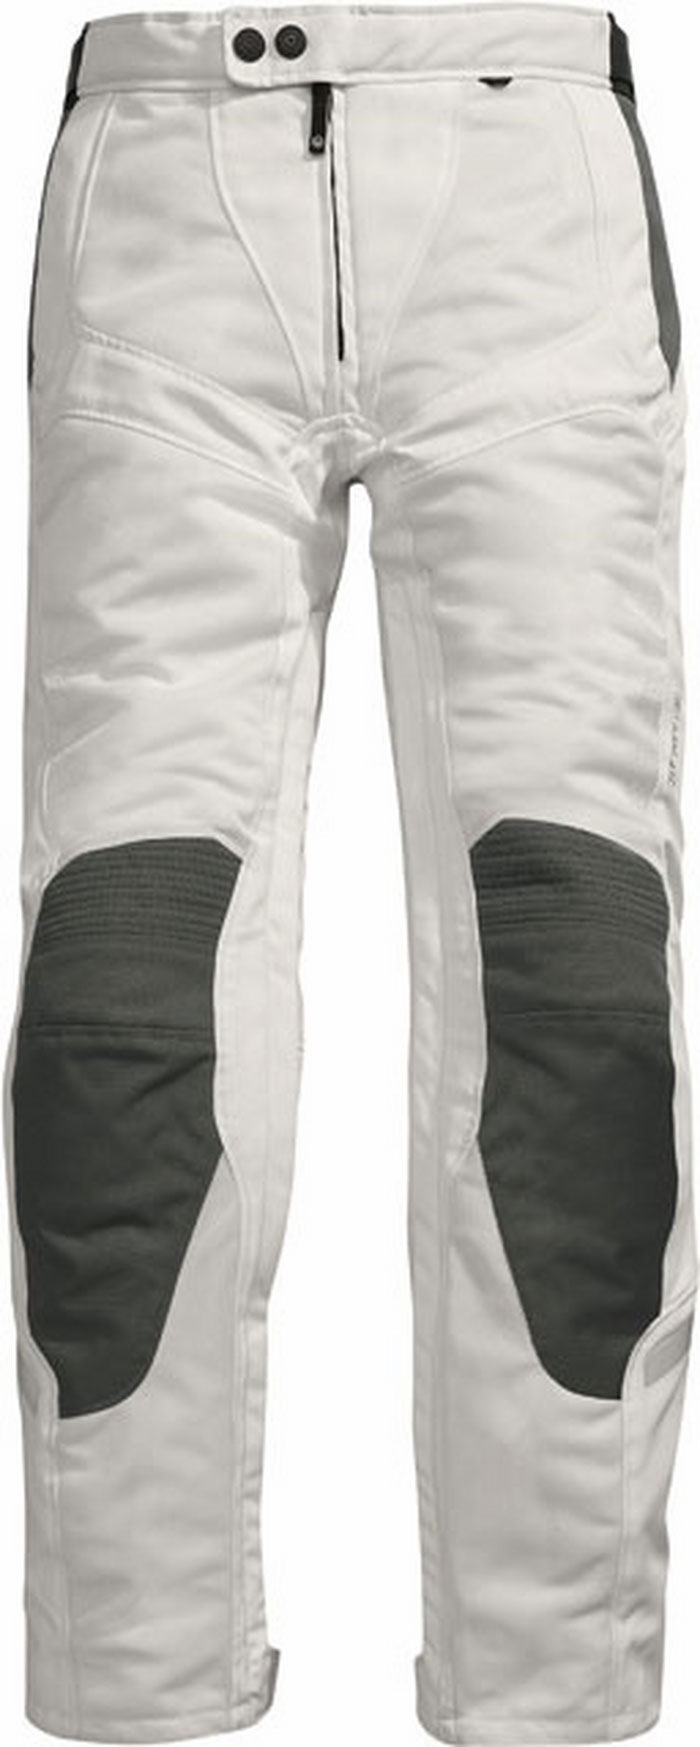 Rev'it Airwave Ladies summer motrocycle pants white-anthracite